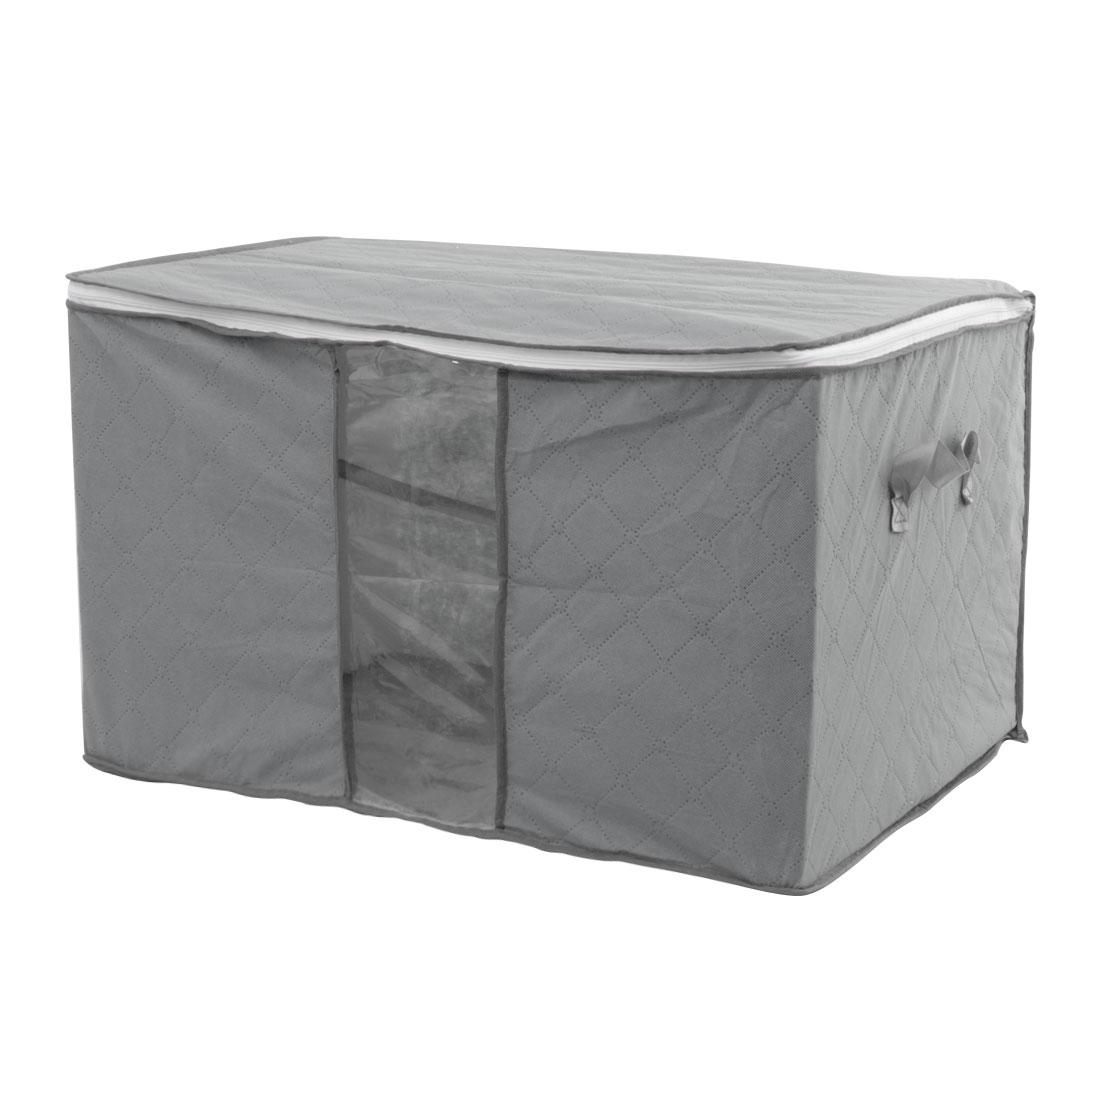 Home Bedding Quilt Blanket Pillow Dustproof Storage Bag Organizer Gray